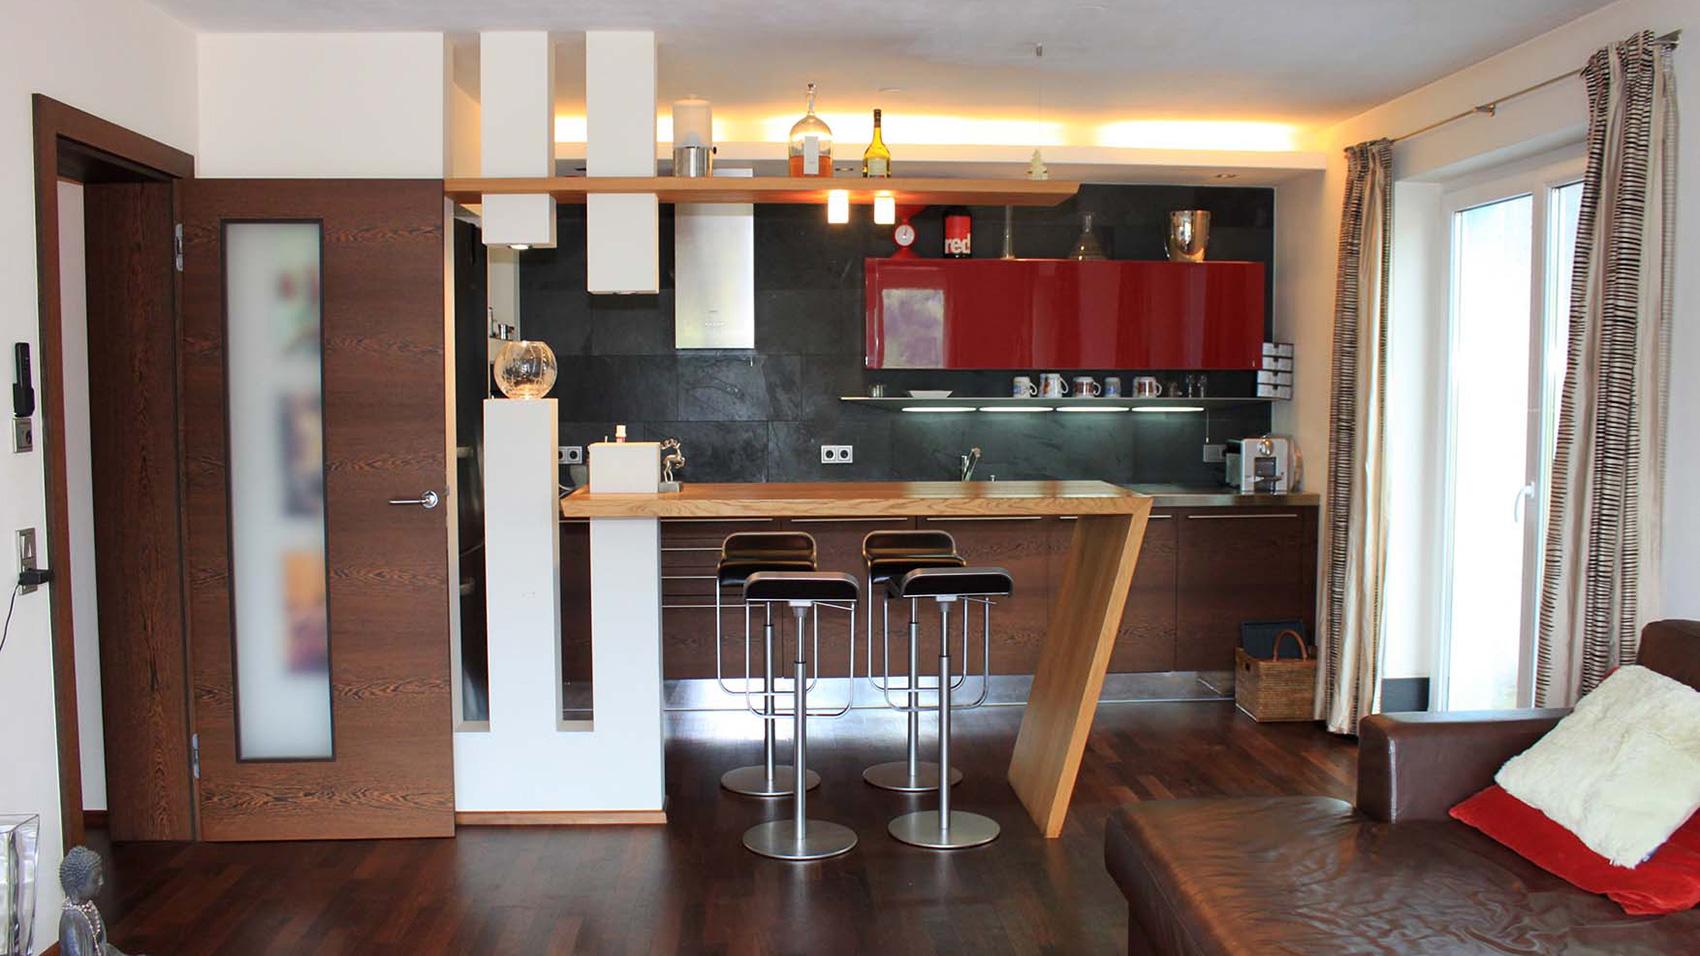 Lakeview Apartment Apartments, Austria